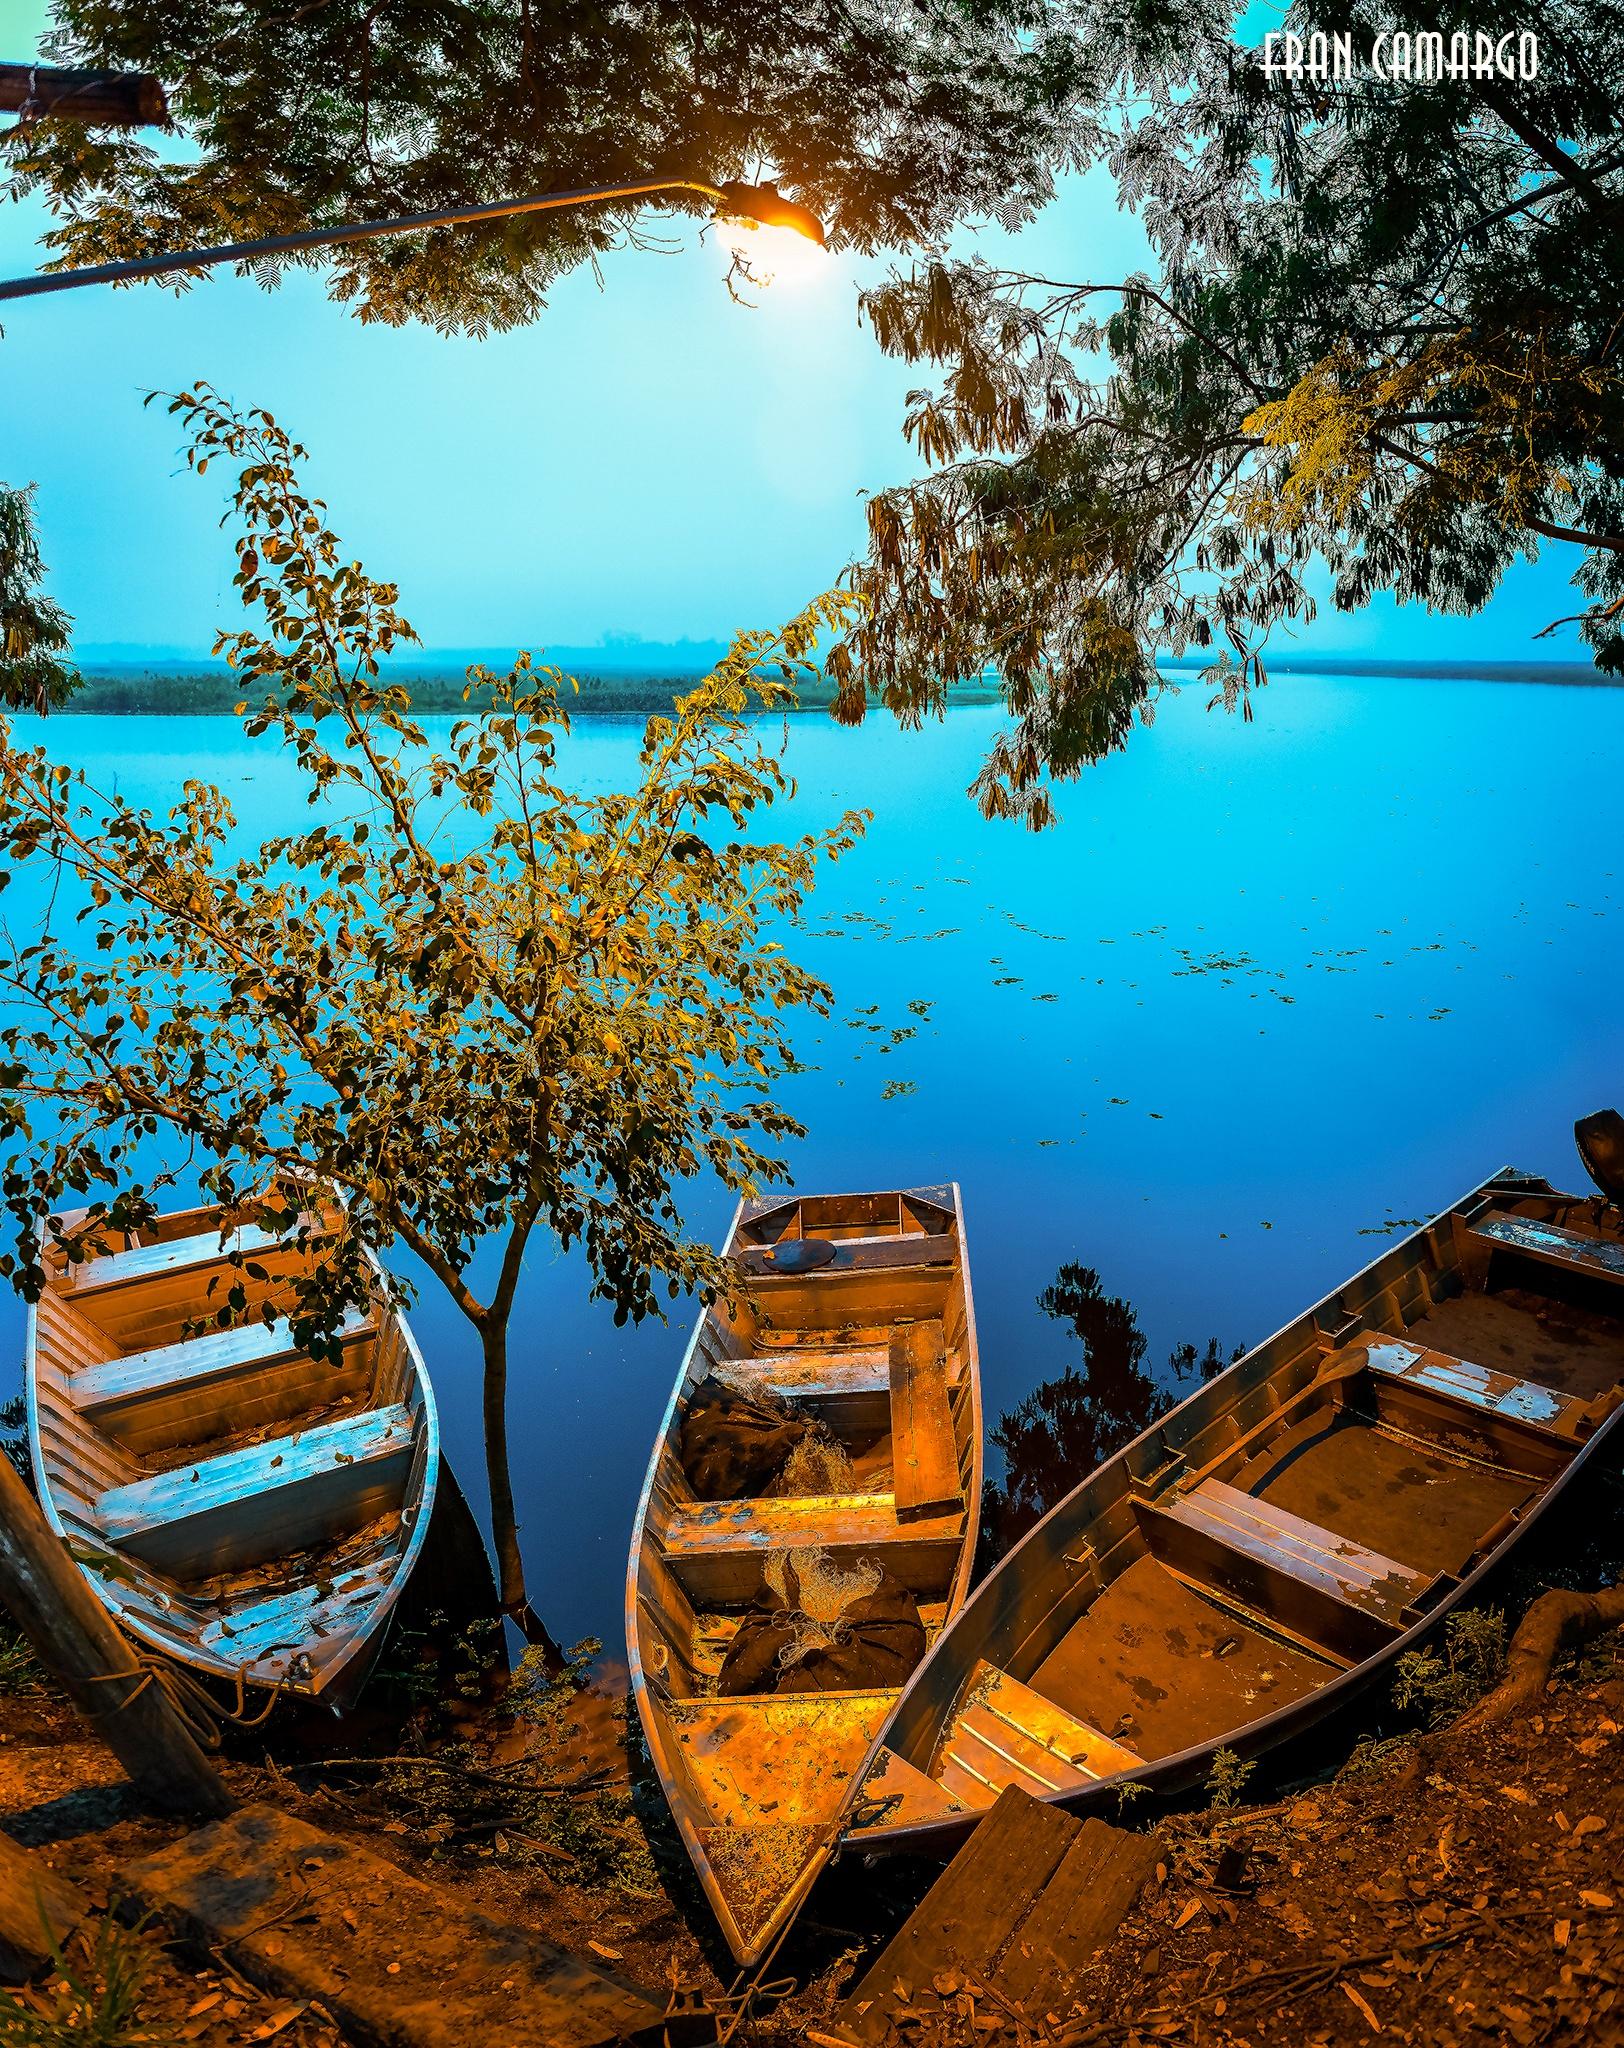 boats by Fran Camargo